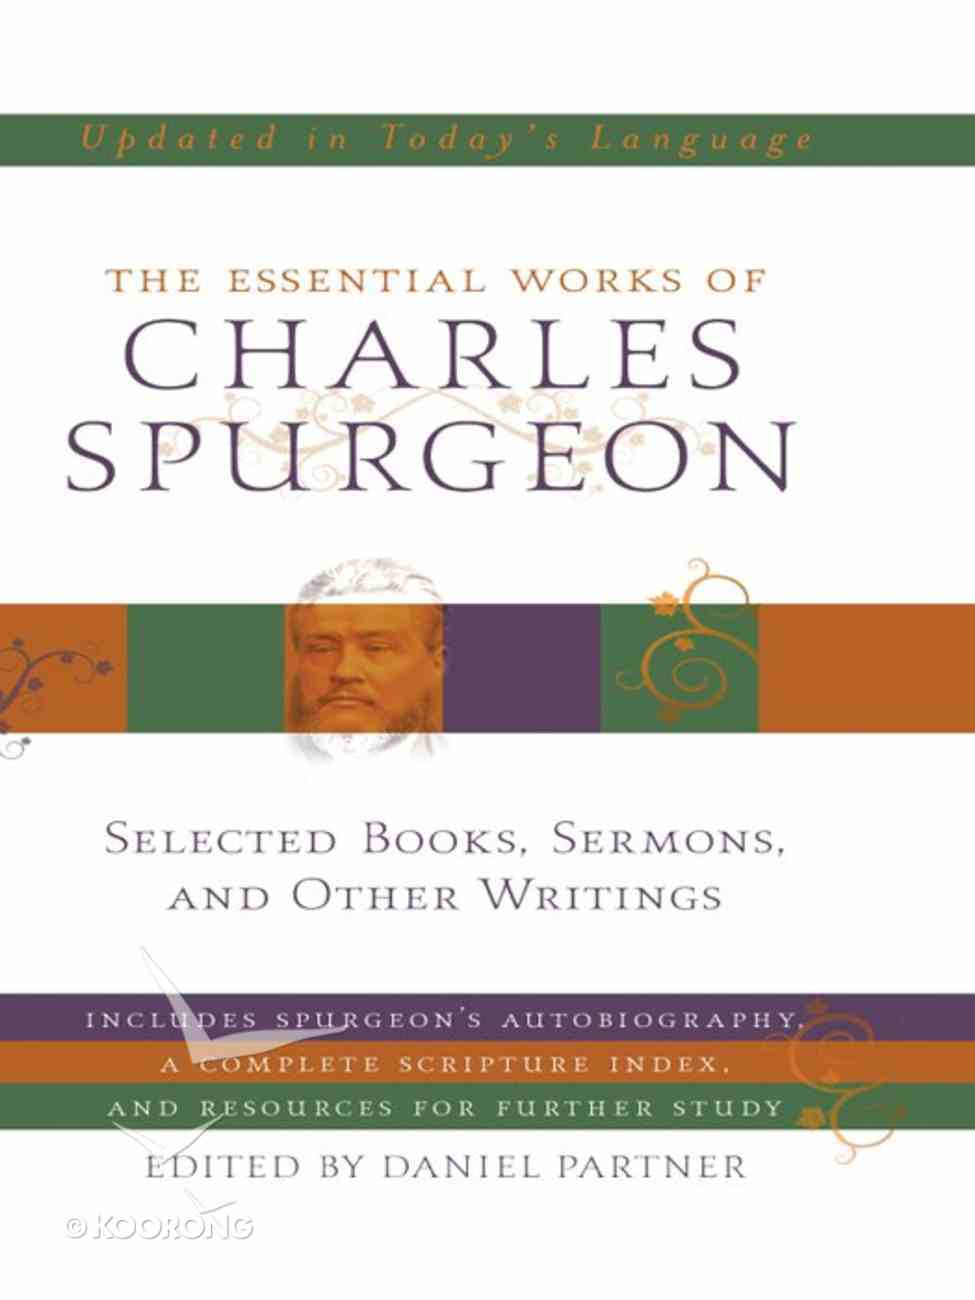 The Essential Works of Charles Spurgeon eBook